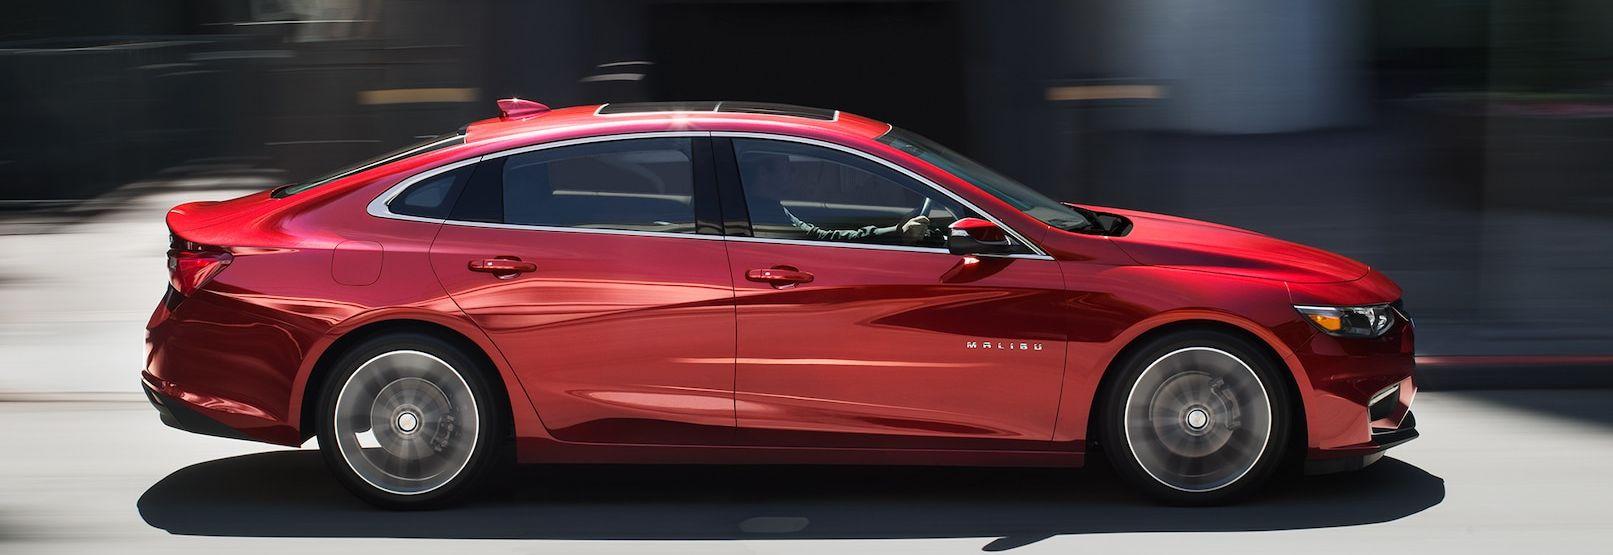 2018 Chevrolet Malibu Financing near Edmond, OK